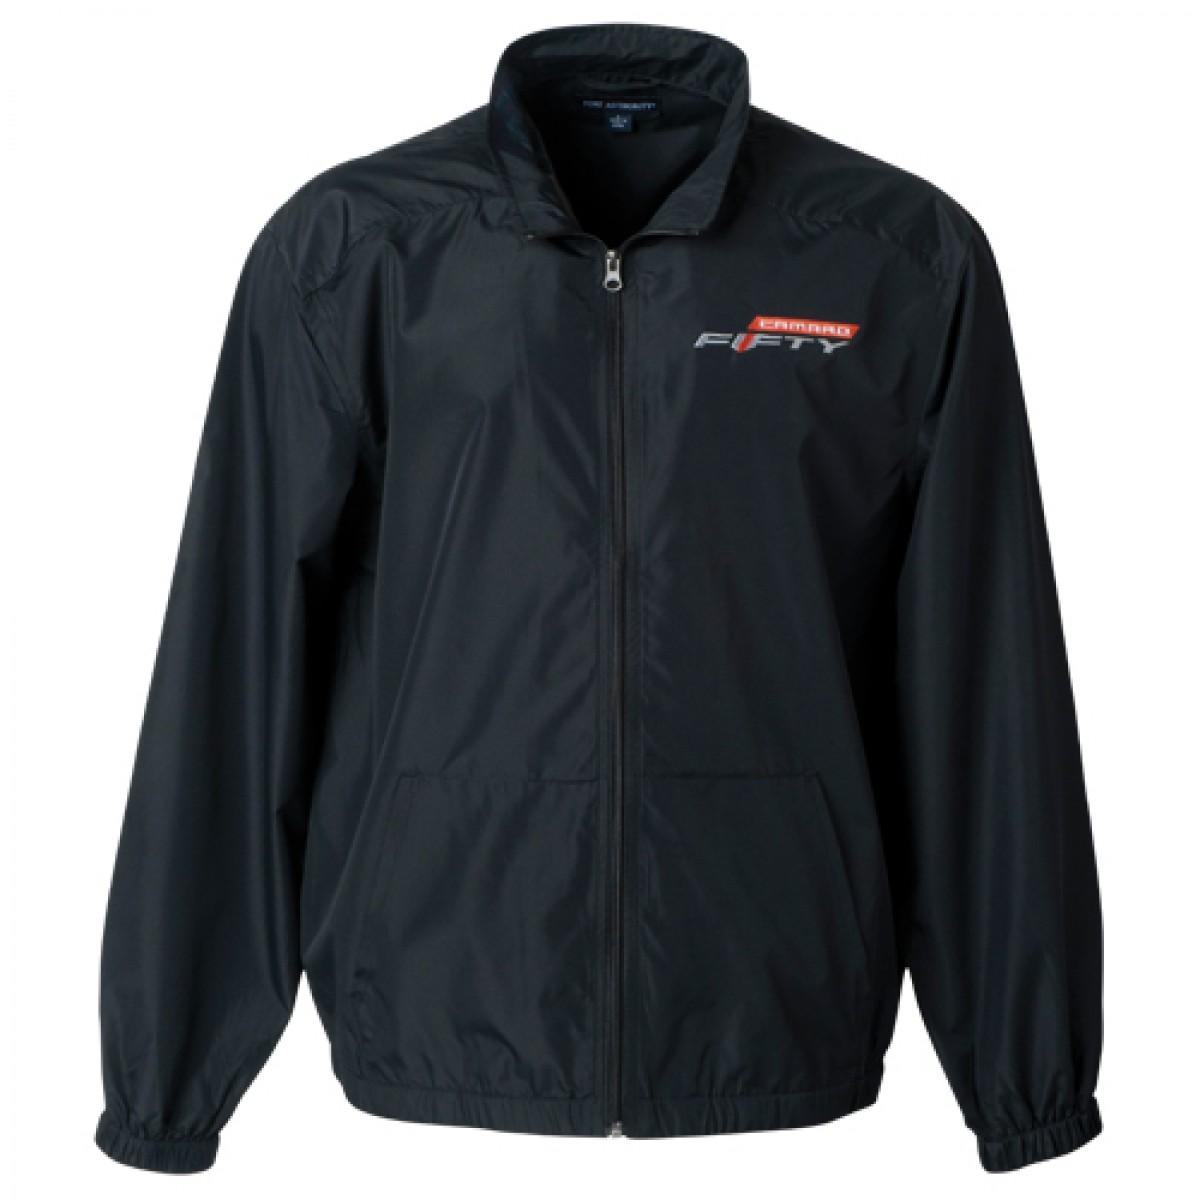 50th Anniversary Camaro Essential Jacket